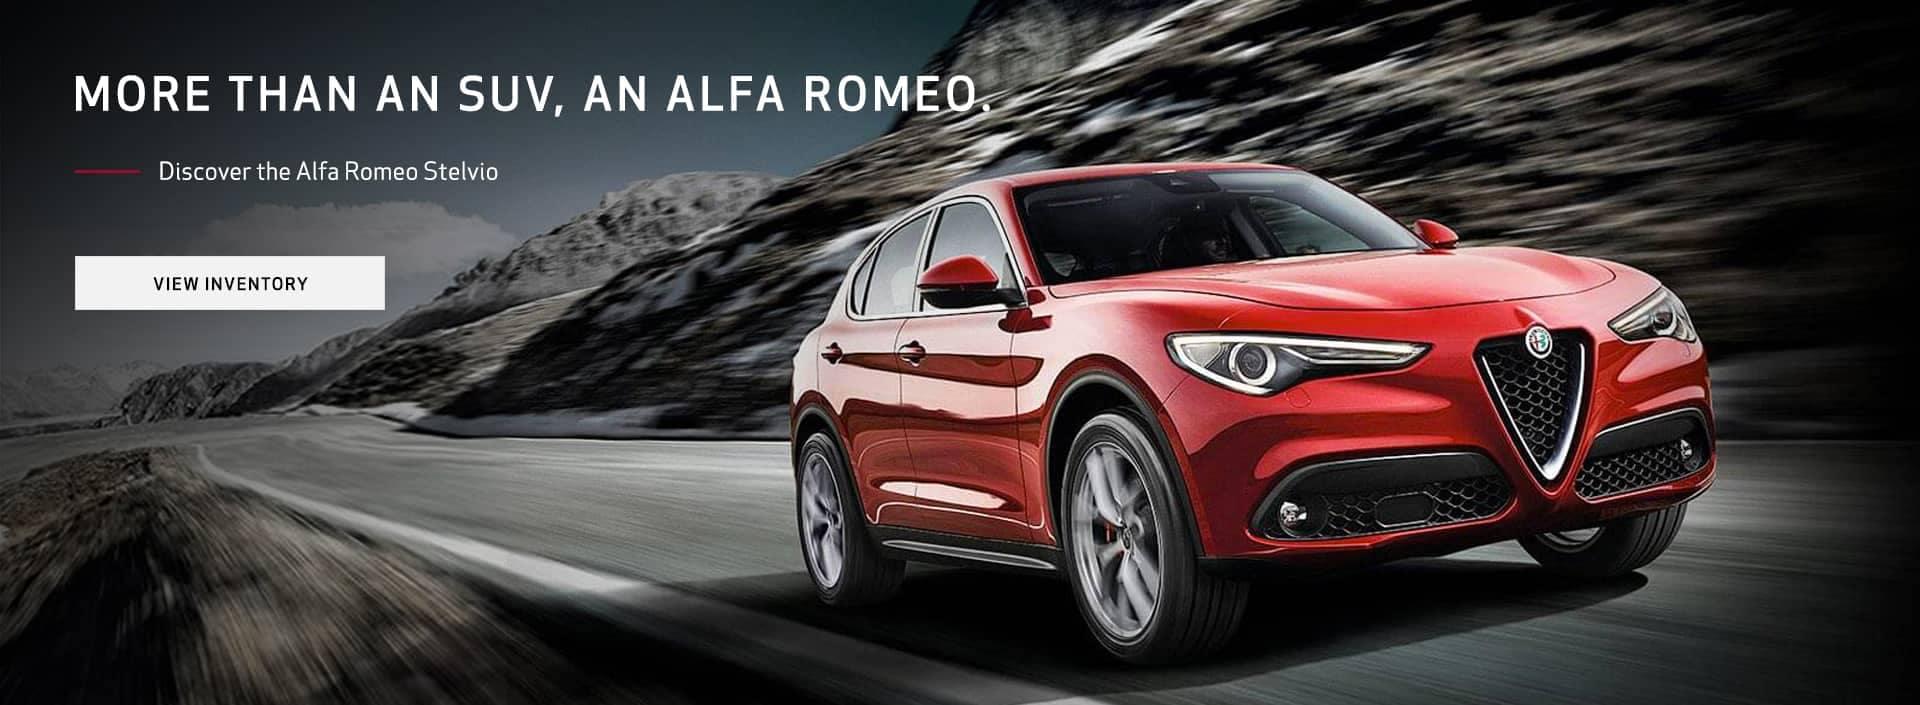 Towne Alfa Romeo | Alfa Romeo Dealer in Williamsville, NY